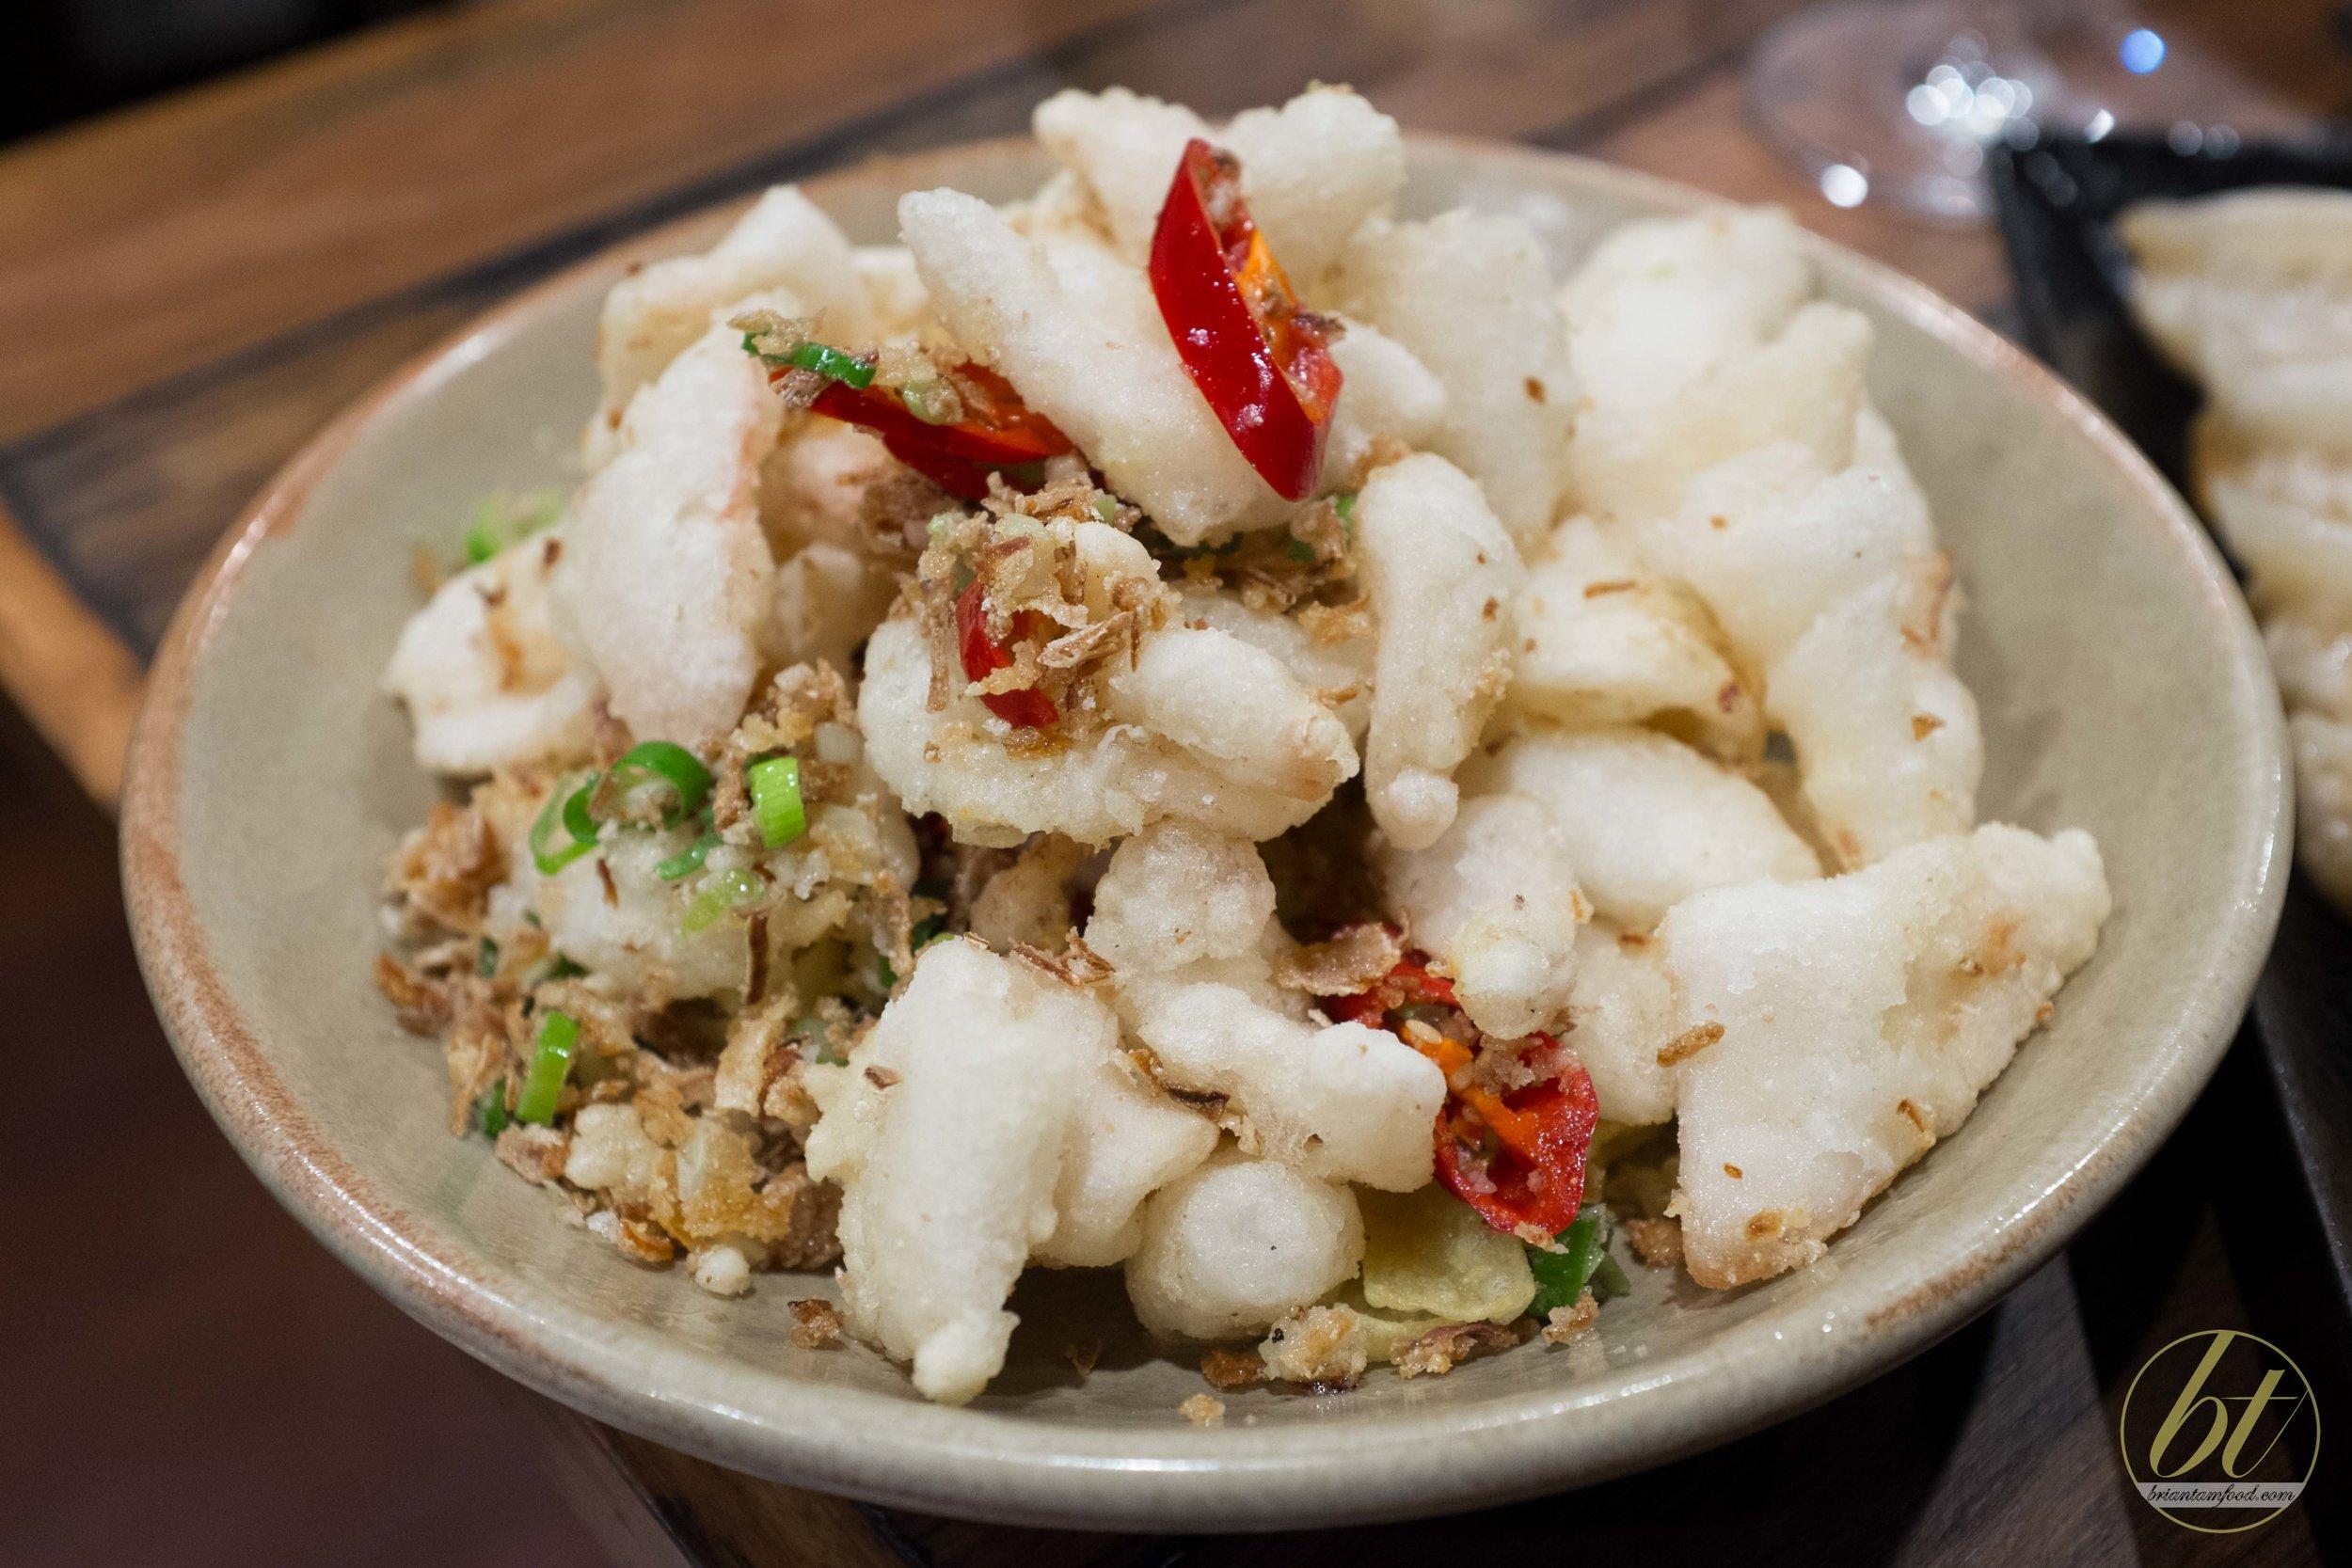 Salt and Pepper Squid ($14.00)